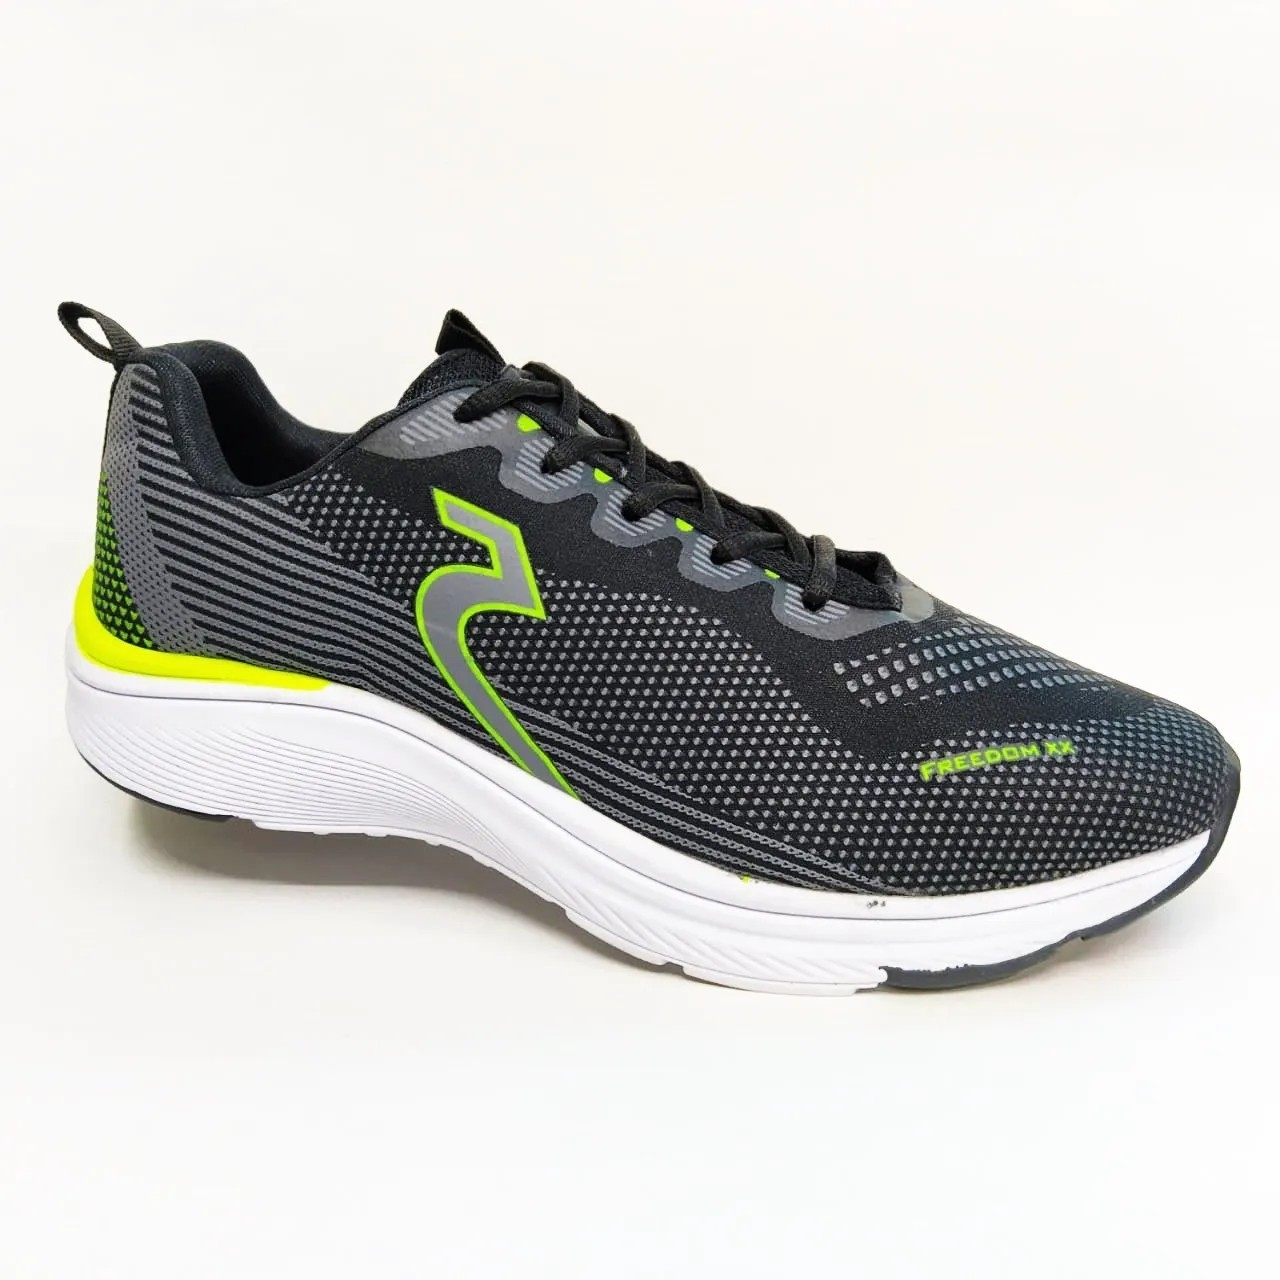 Tênis masculino Replay 20800-15 - Preto / Verde